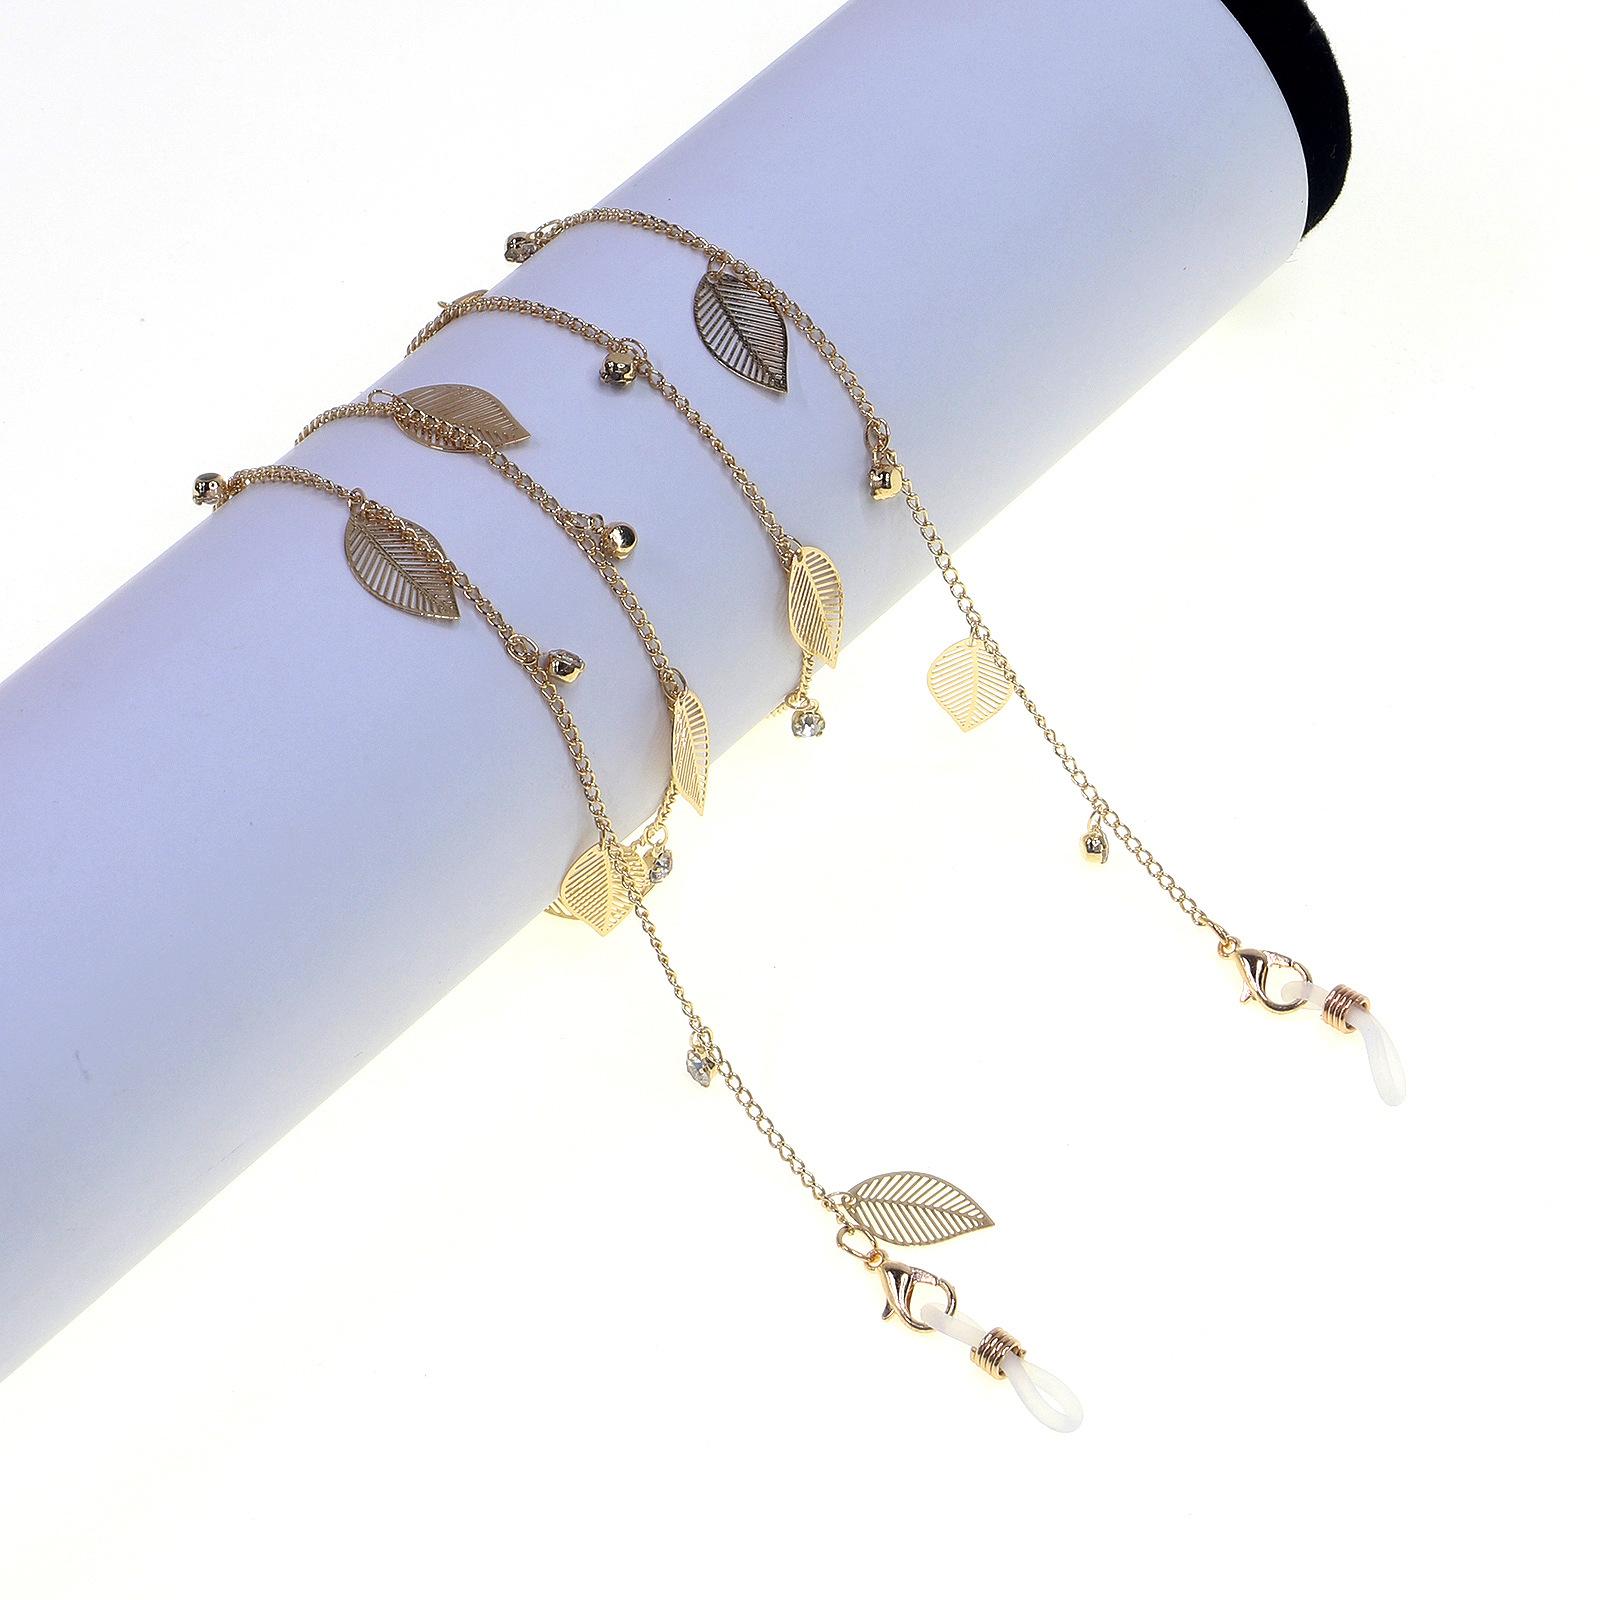 Hot Fashionable Simple Golden Leaves Rhinestone Glasses Chain  wholesale nihaojewelry NHBC220573